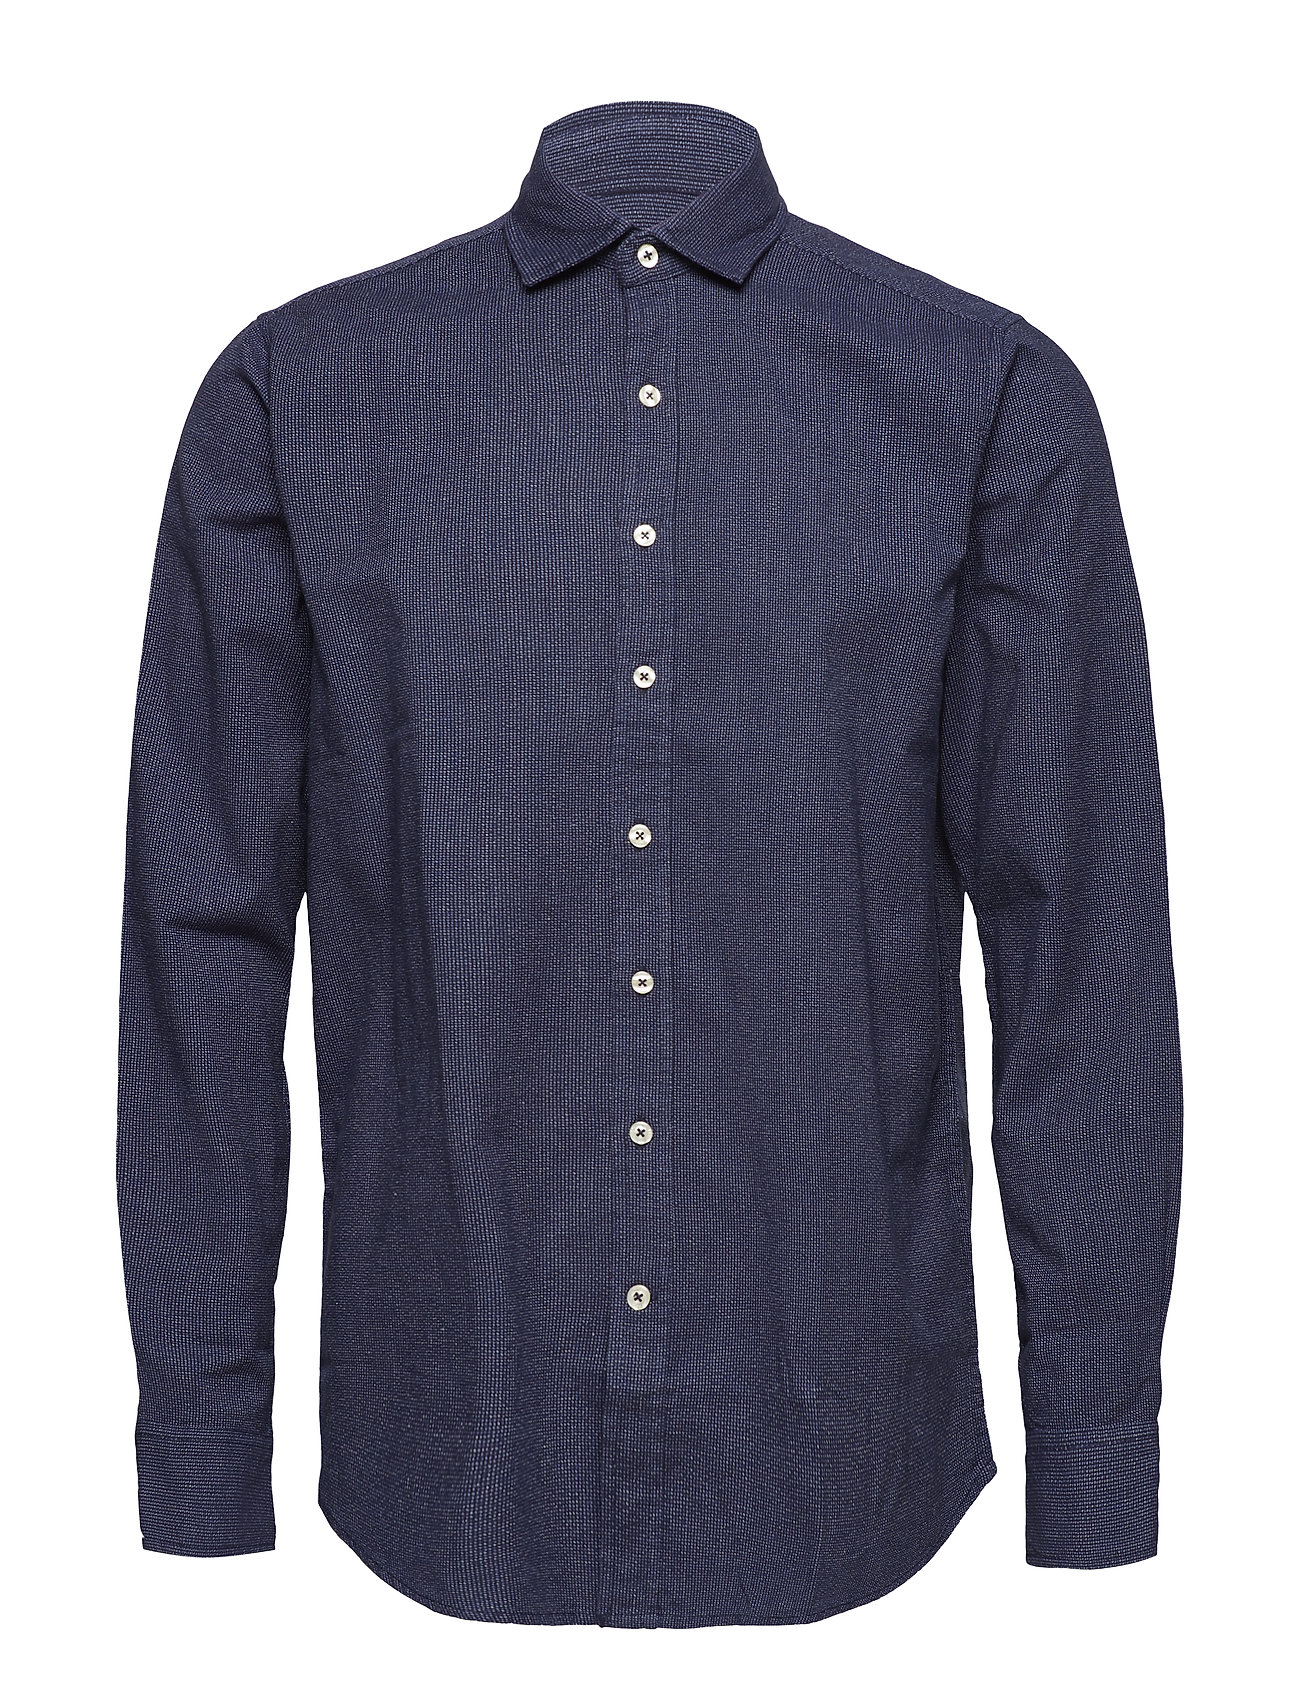 Signal L/S Shirts - DUKE BLUE